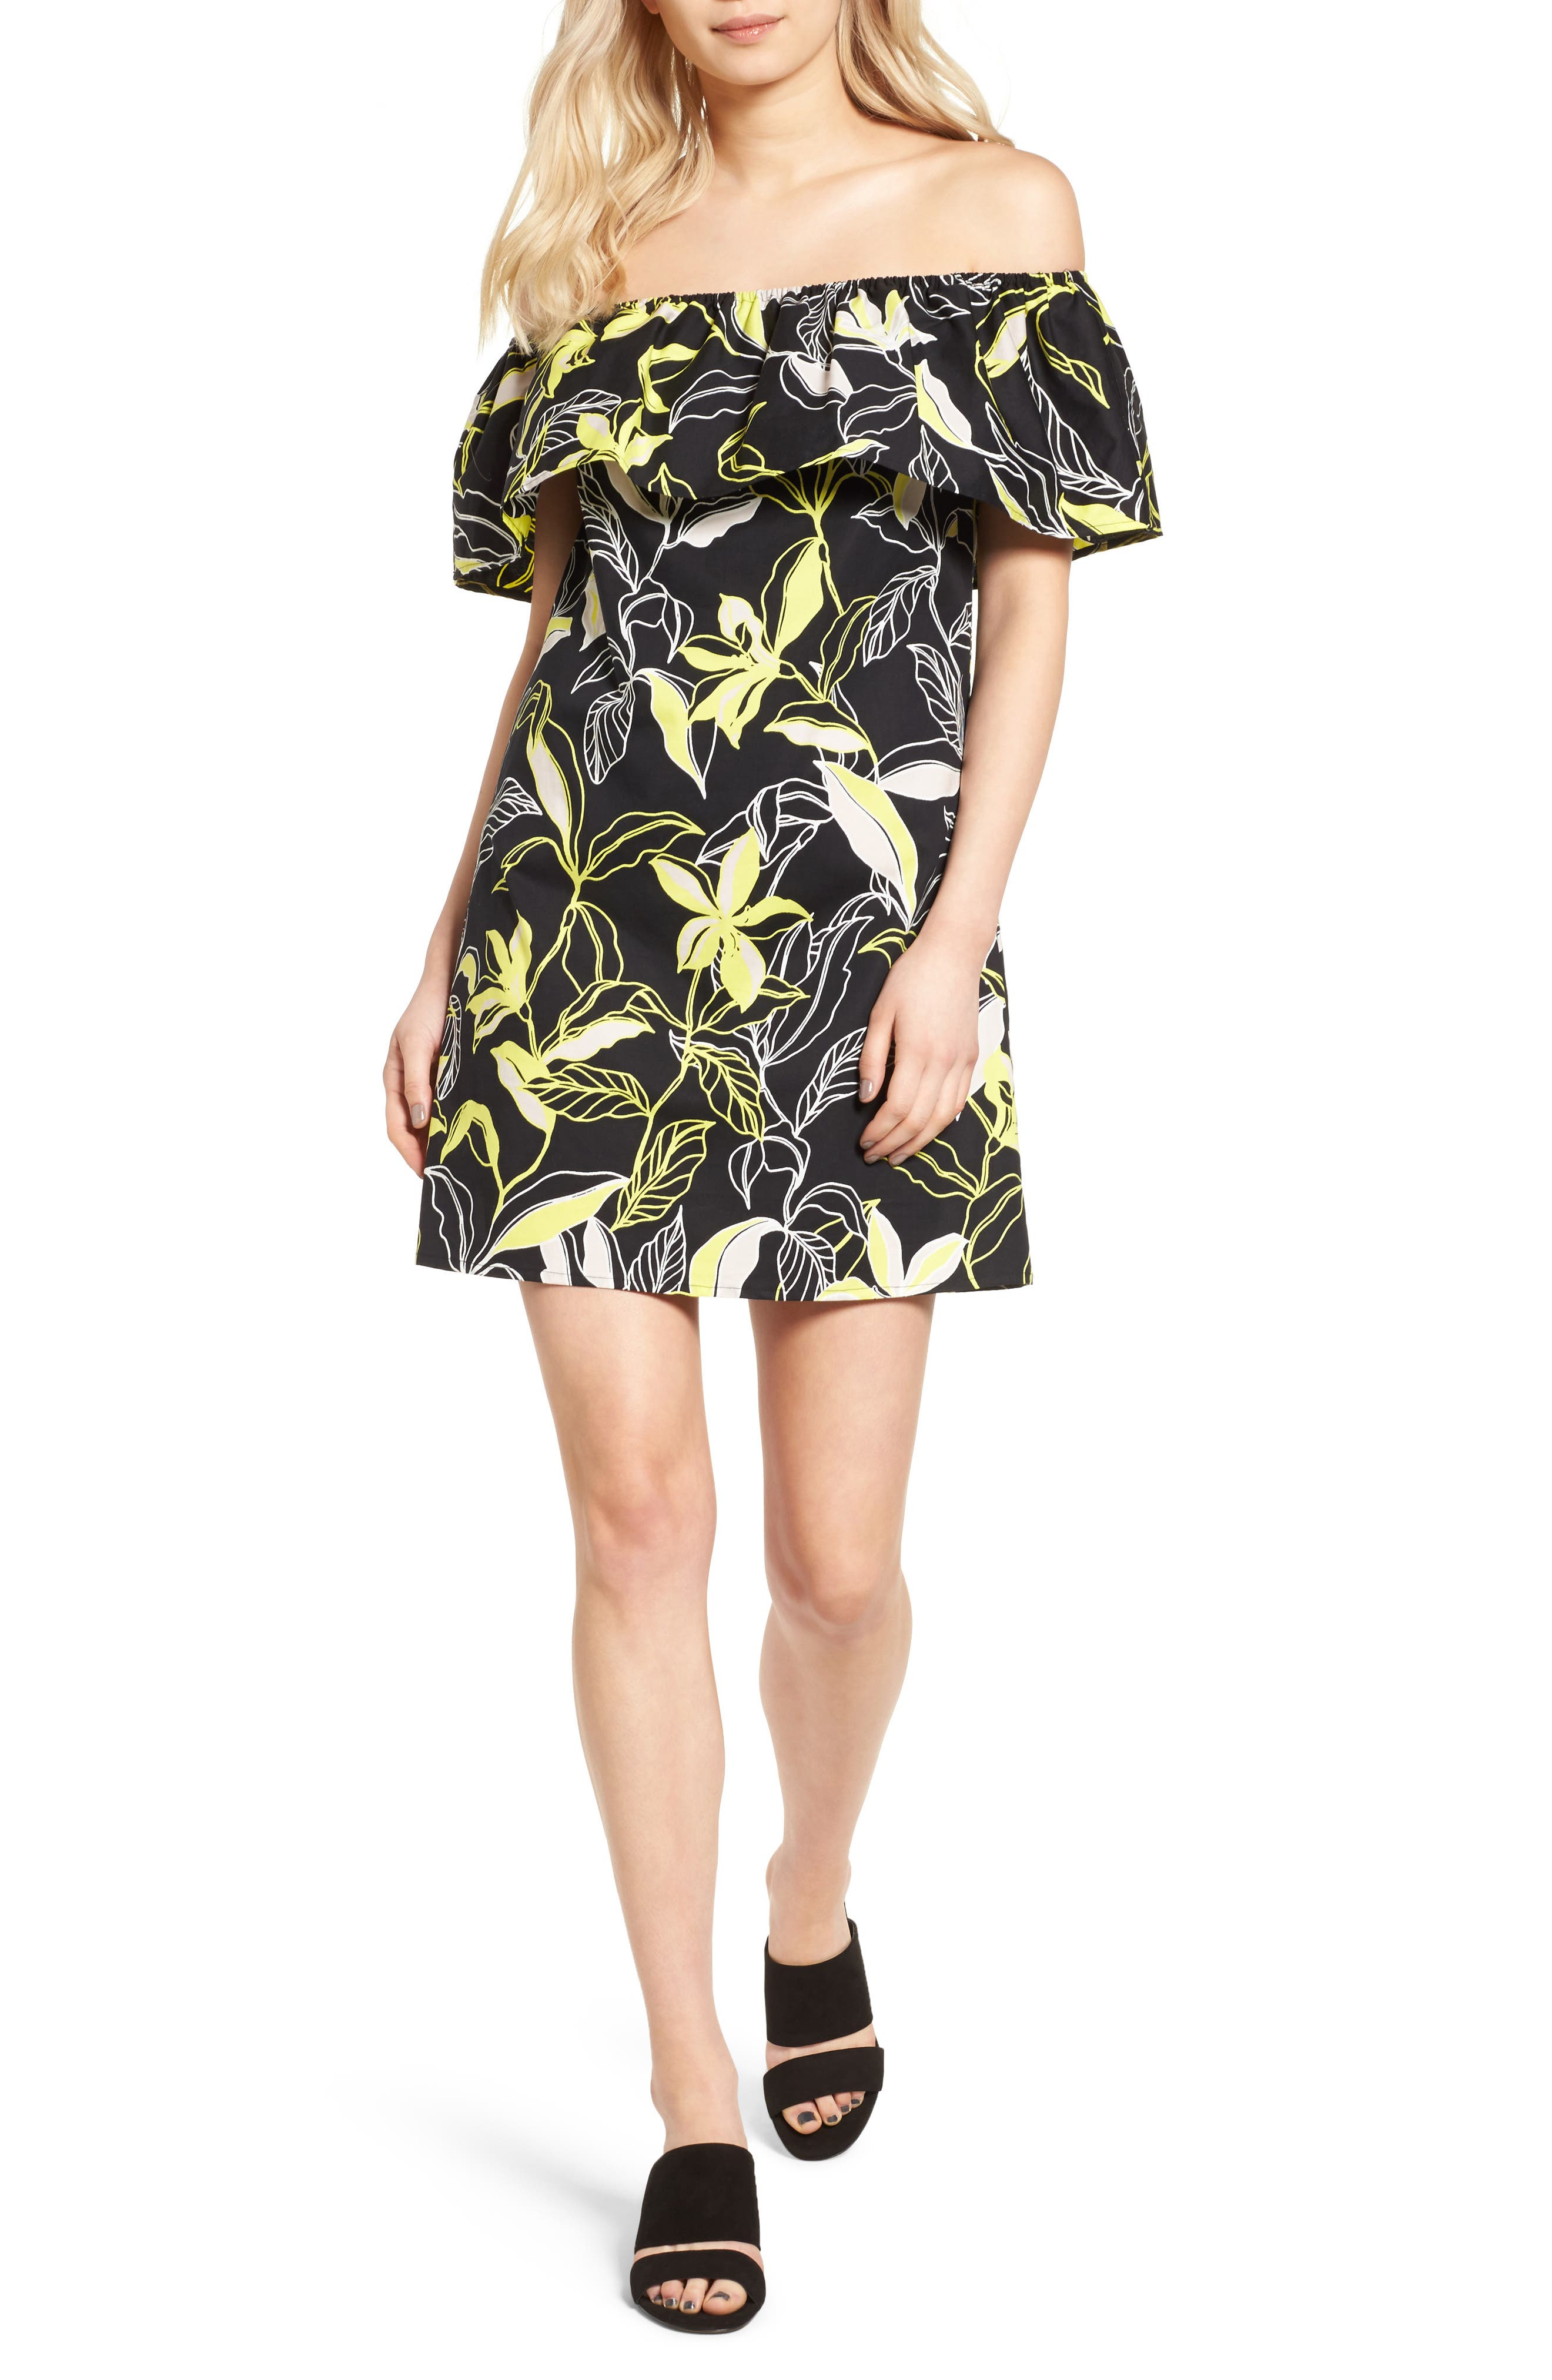 Splendid Tropic Floral Shift Dress